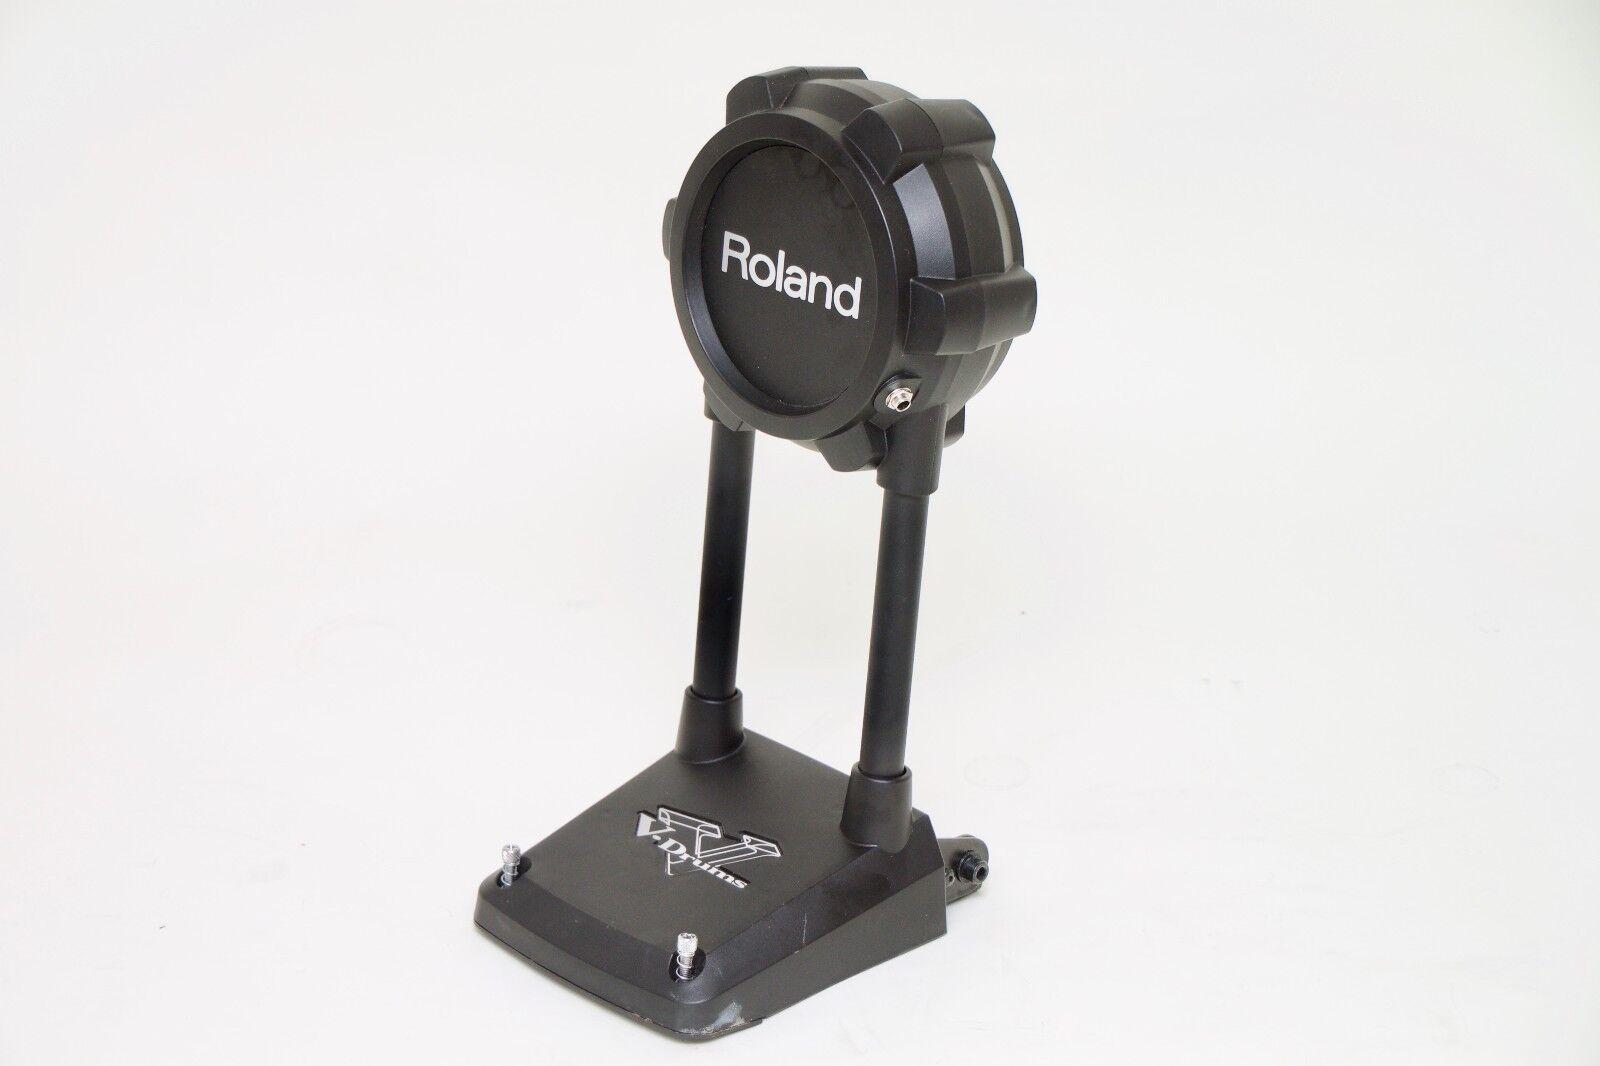 Roland KD-9 8  Kick Bass Head Drum Trigger Pad V-Drums Electronic V-Drums